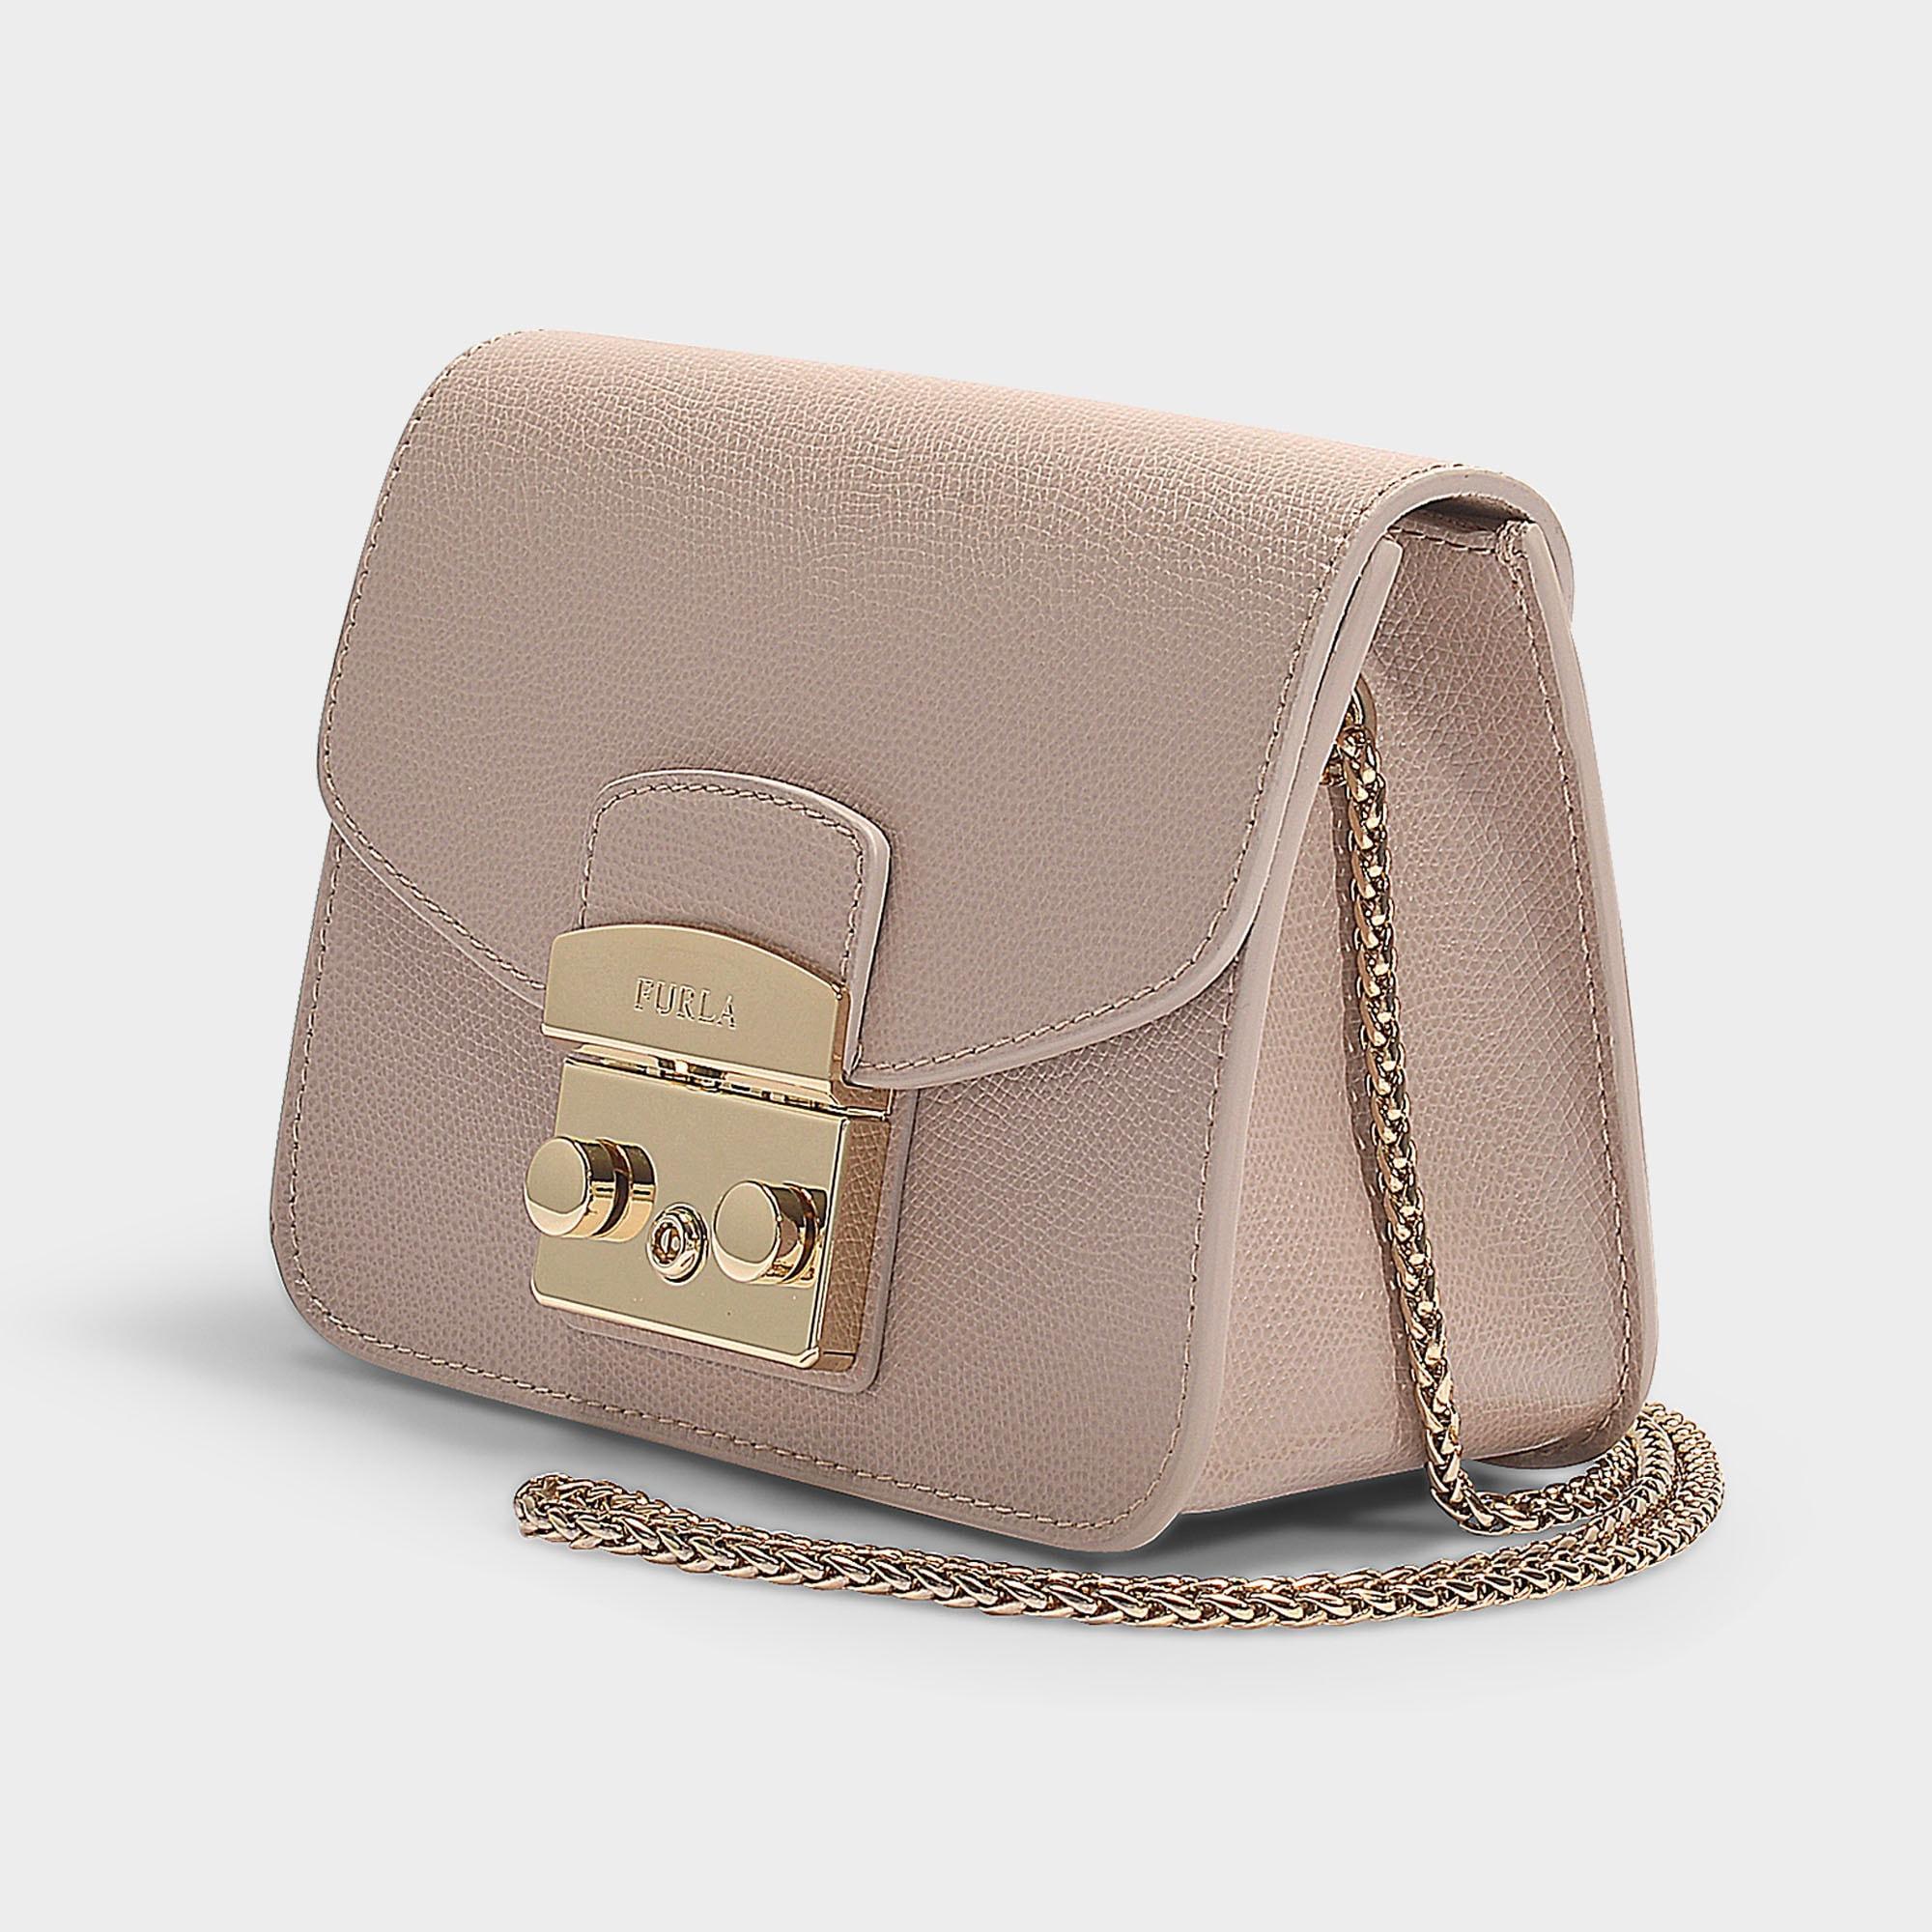 9d75f5154e1b0 Lyst - Furla Metropolis Mini Crossbody Bag In Dalia in Natural ...